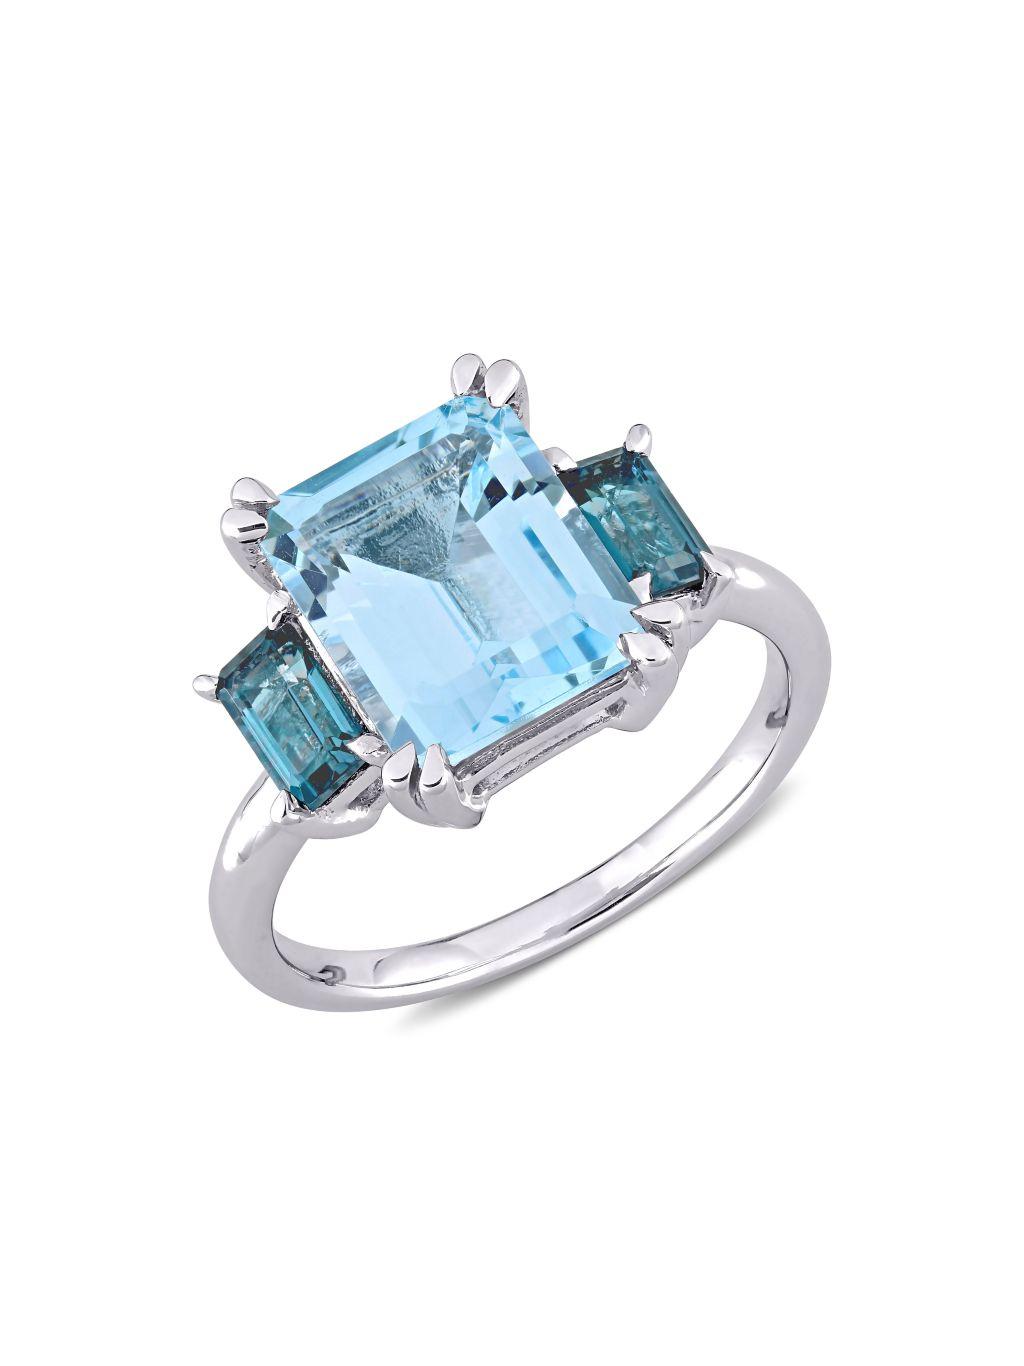 Sonatina 14K White Gold & London Blue & Sky Blue Topaz 3-Stone Ring